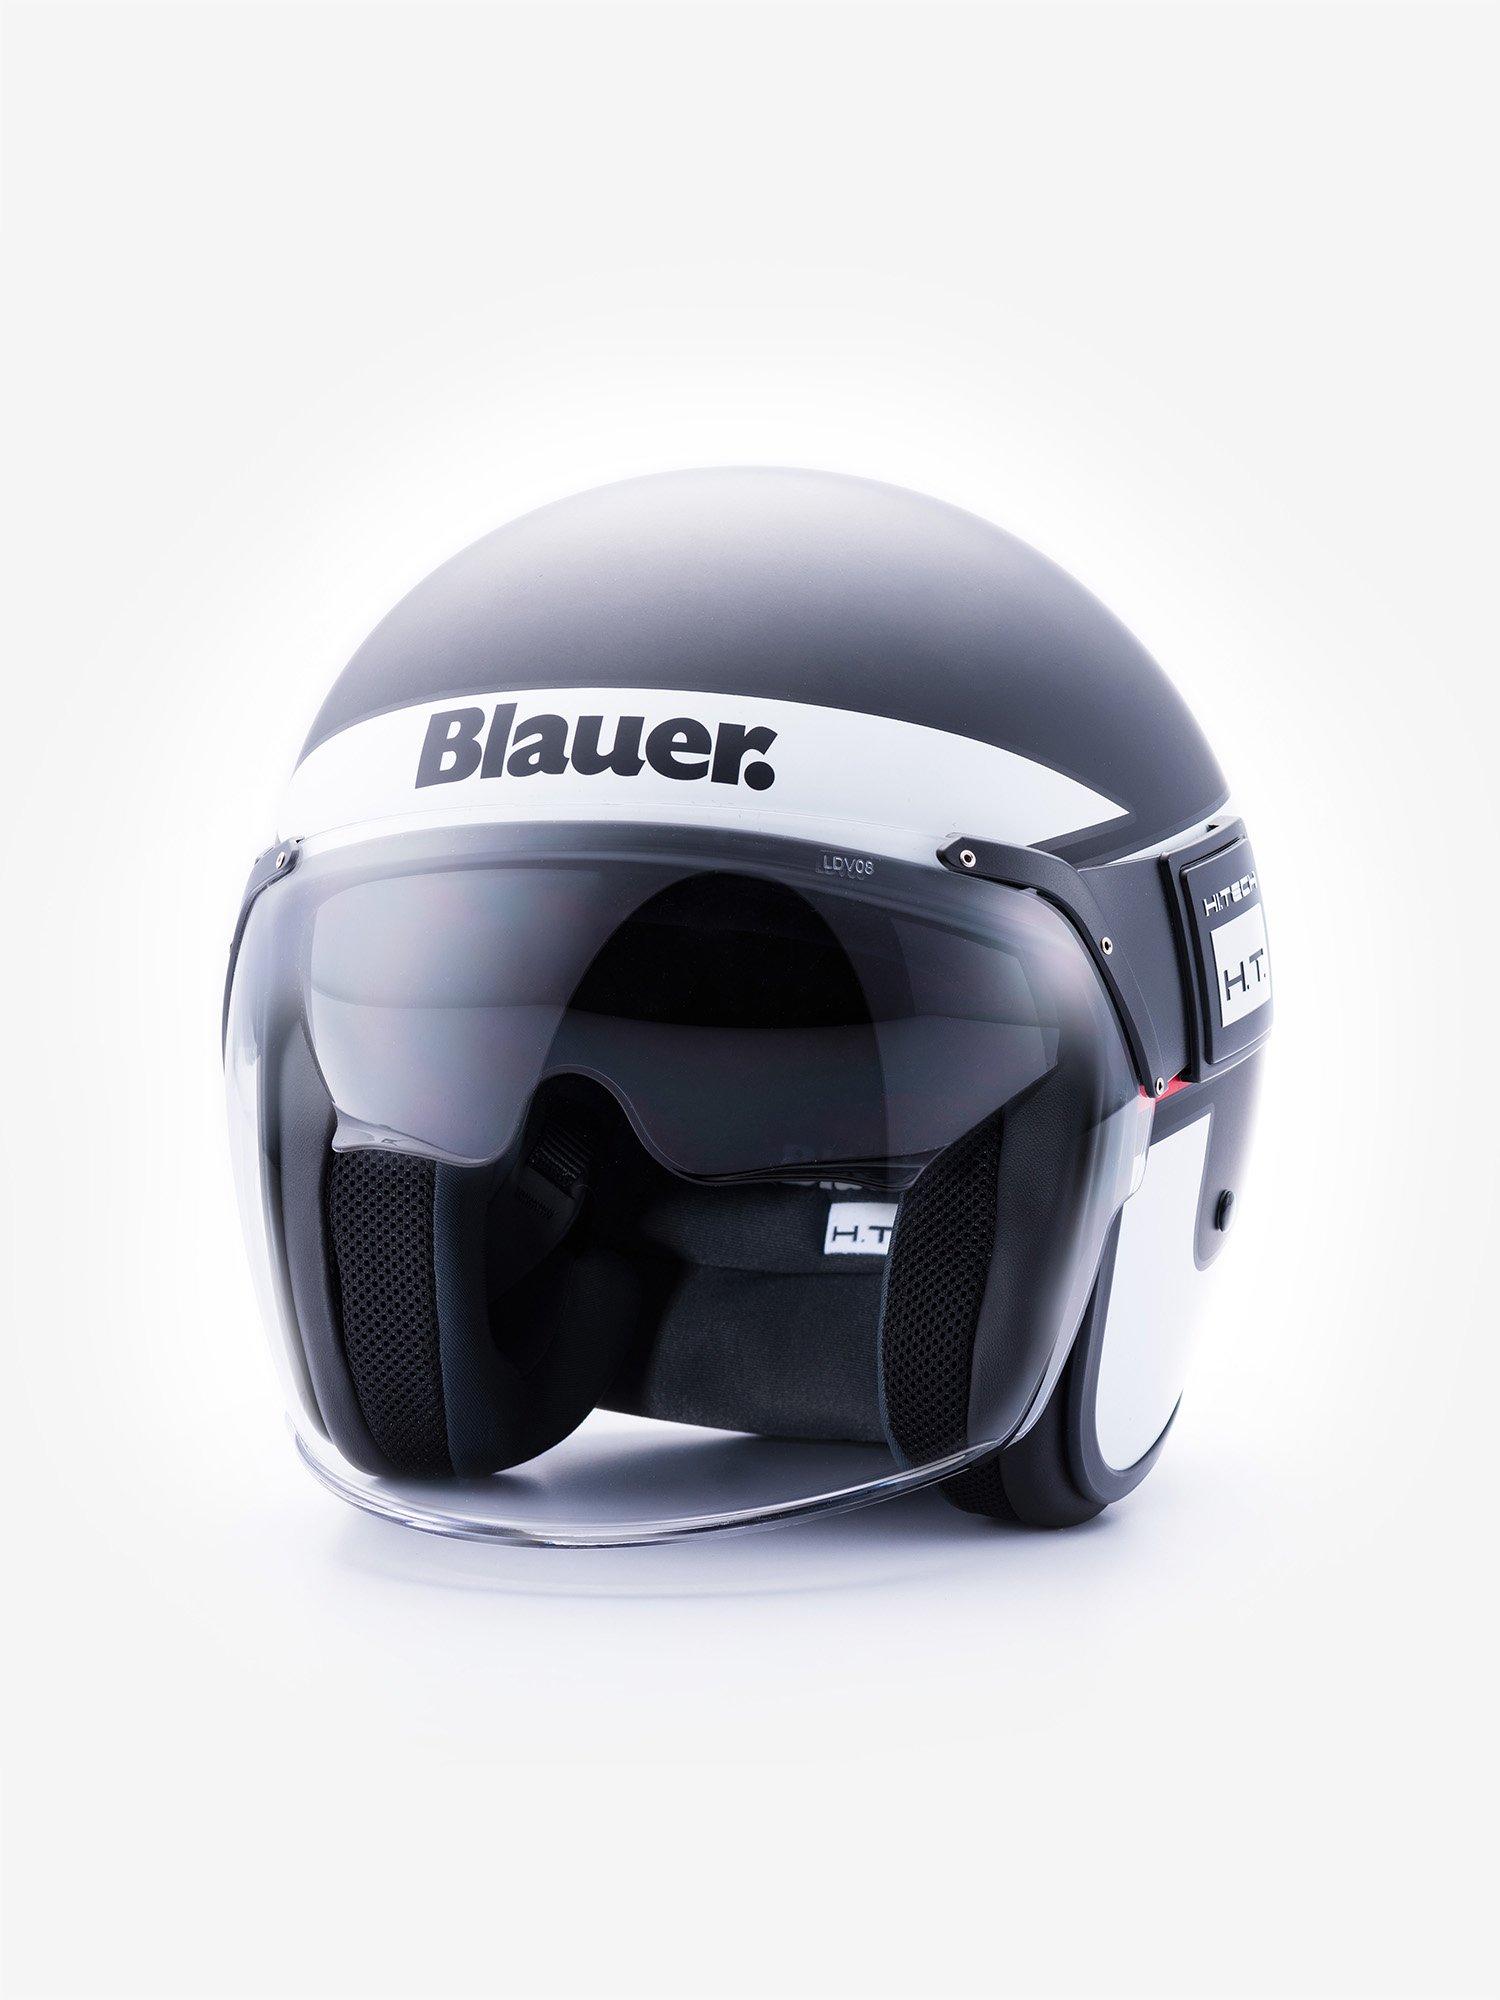 Blauer - POD STRIPES DOUBLE VISOR - Black Matt / Red - Blauer